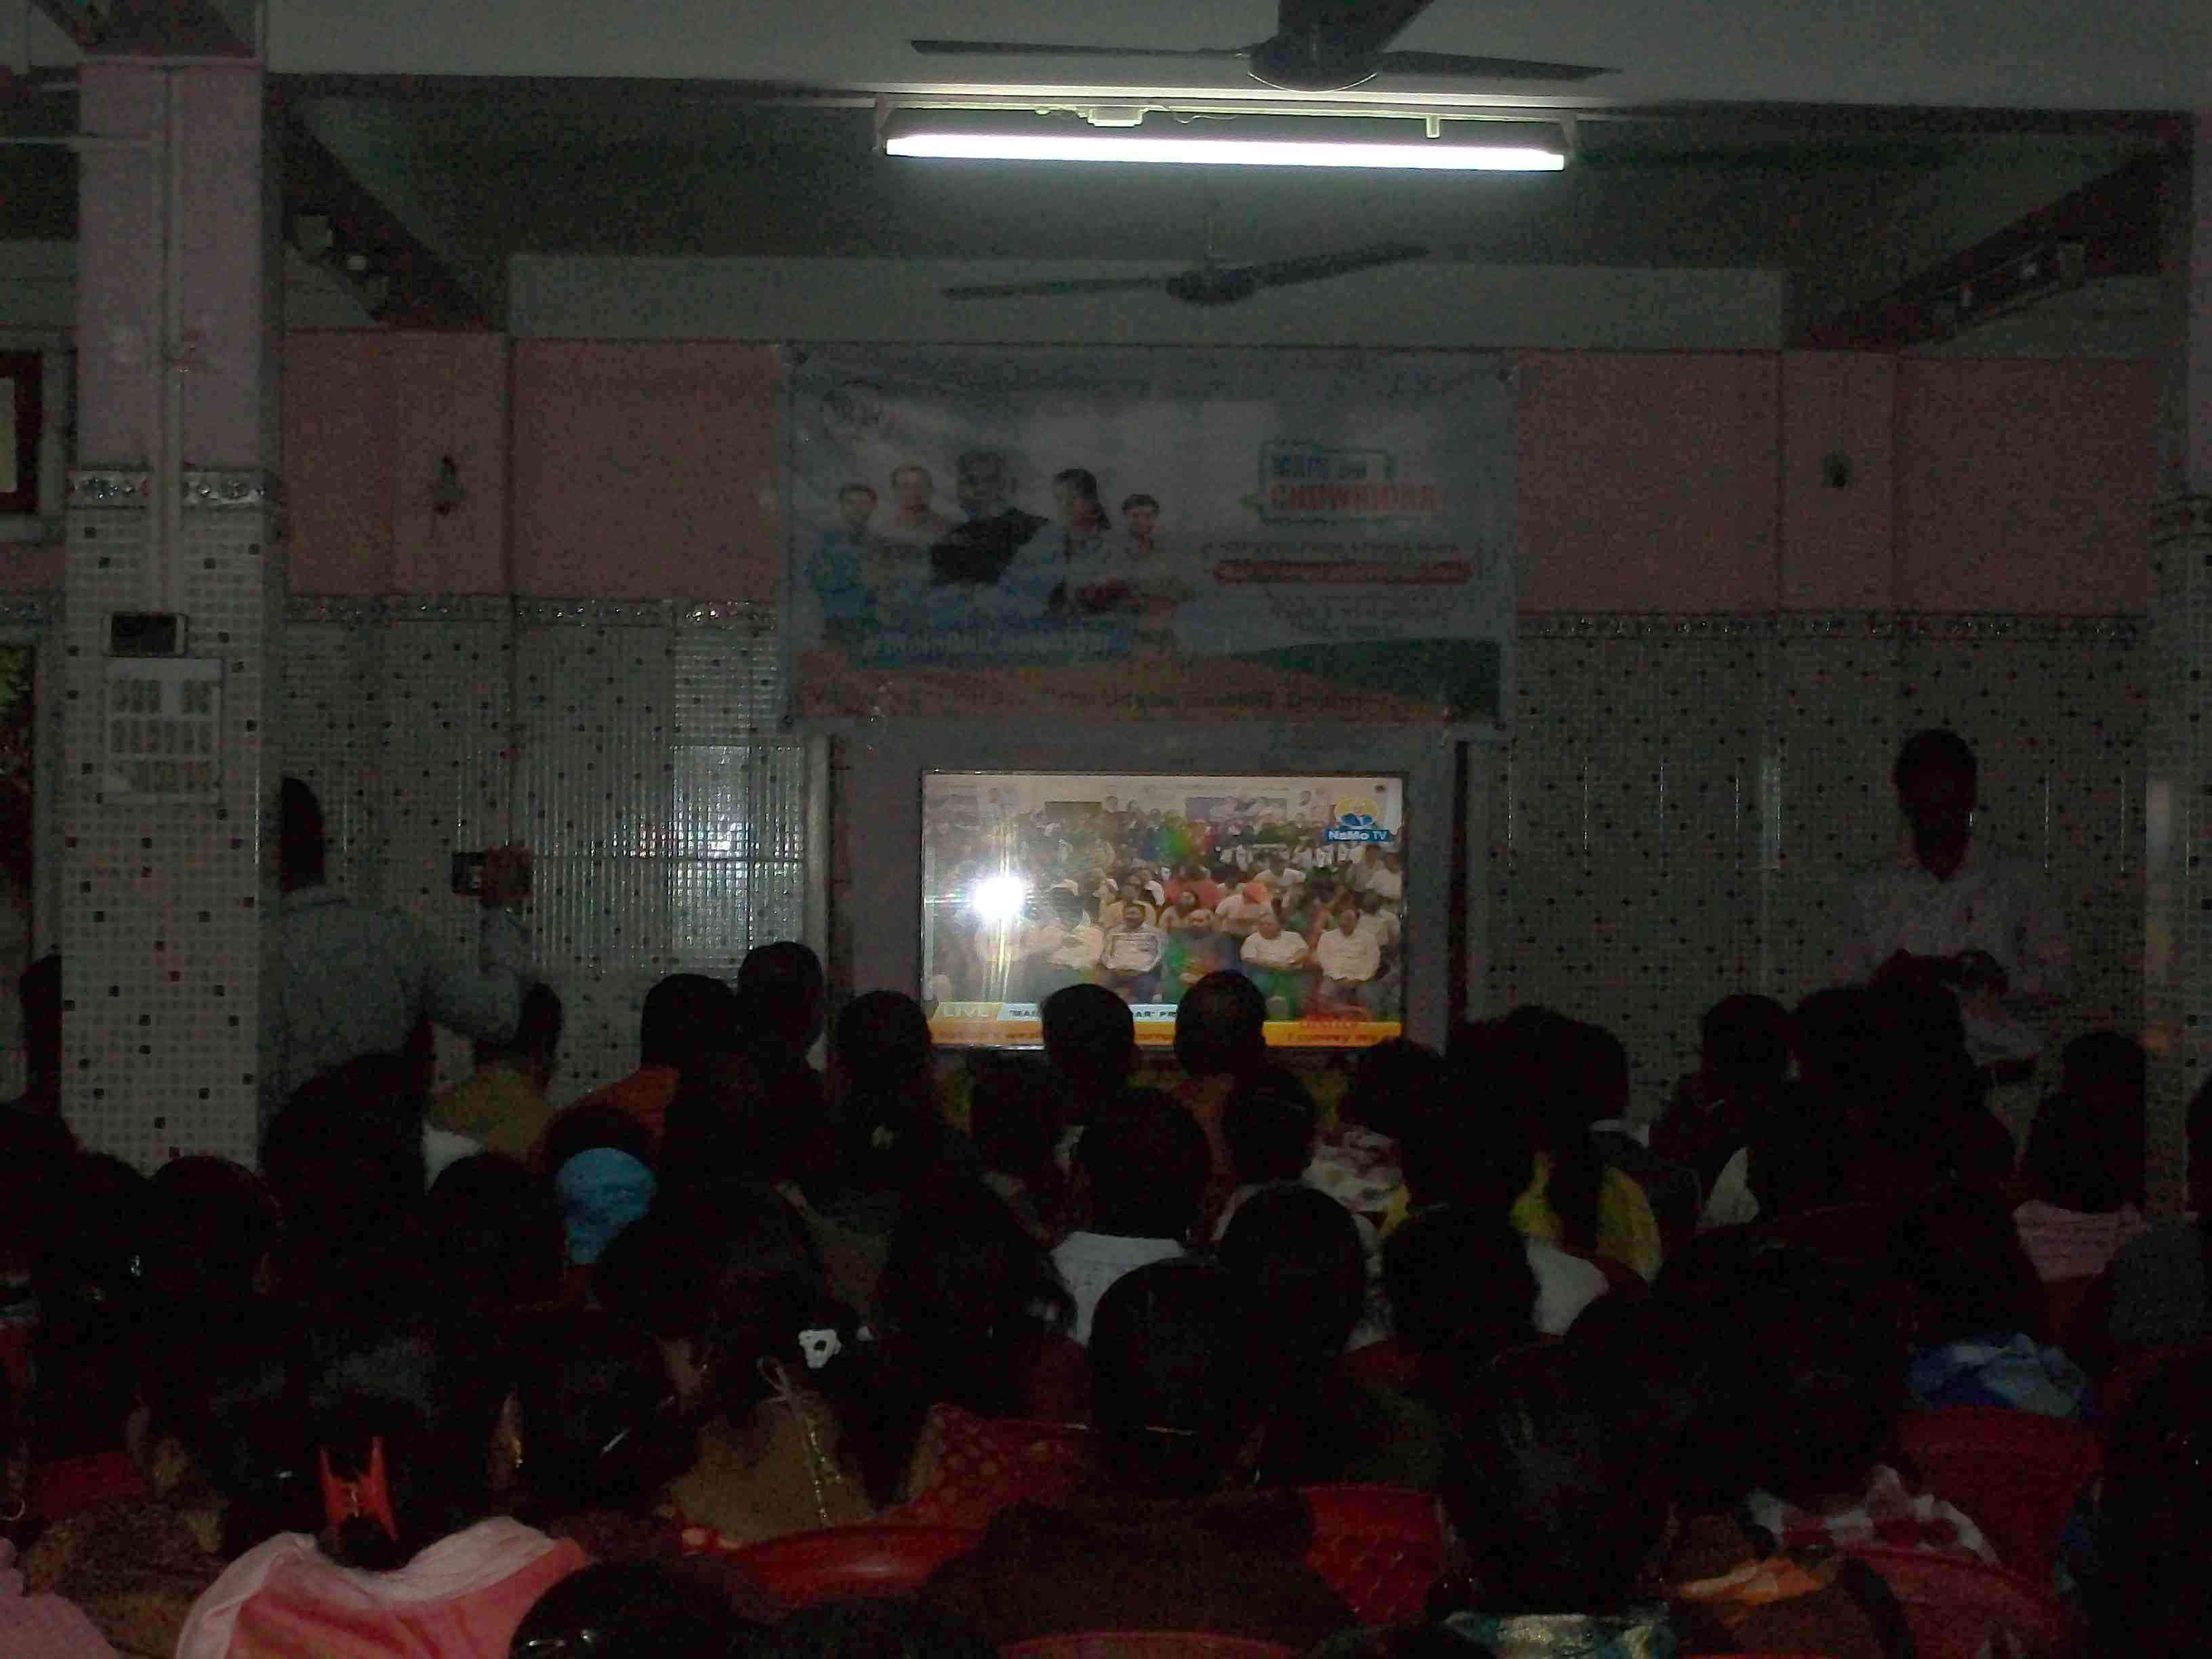 Bengali Hindus in Dhubri town gather for a screening of 'Main Bhi Chowkidaar' on NaMo TV. (Photo credit: Ipsita Chakravarty).